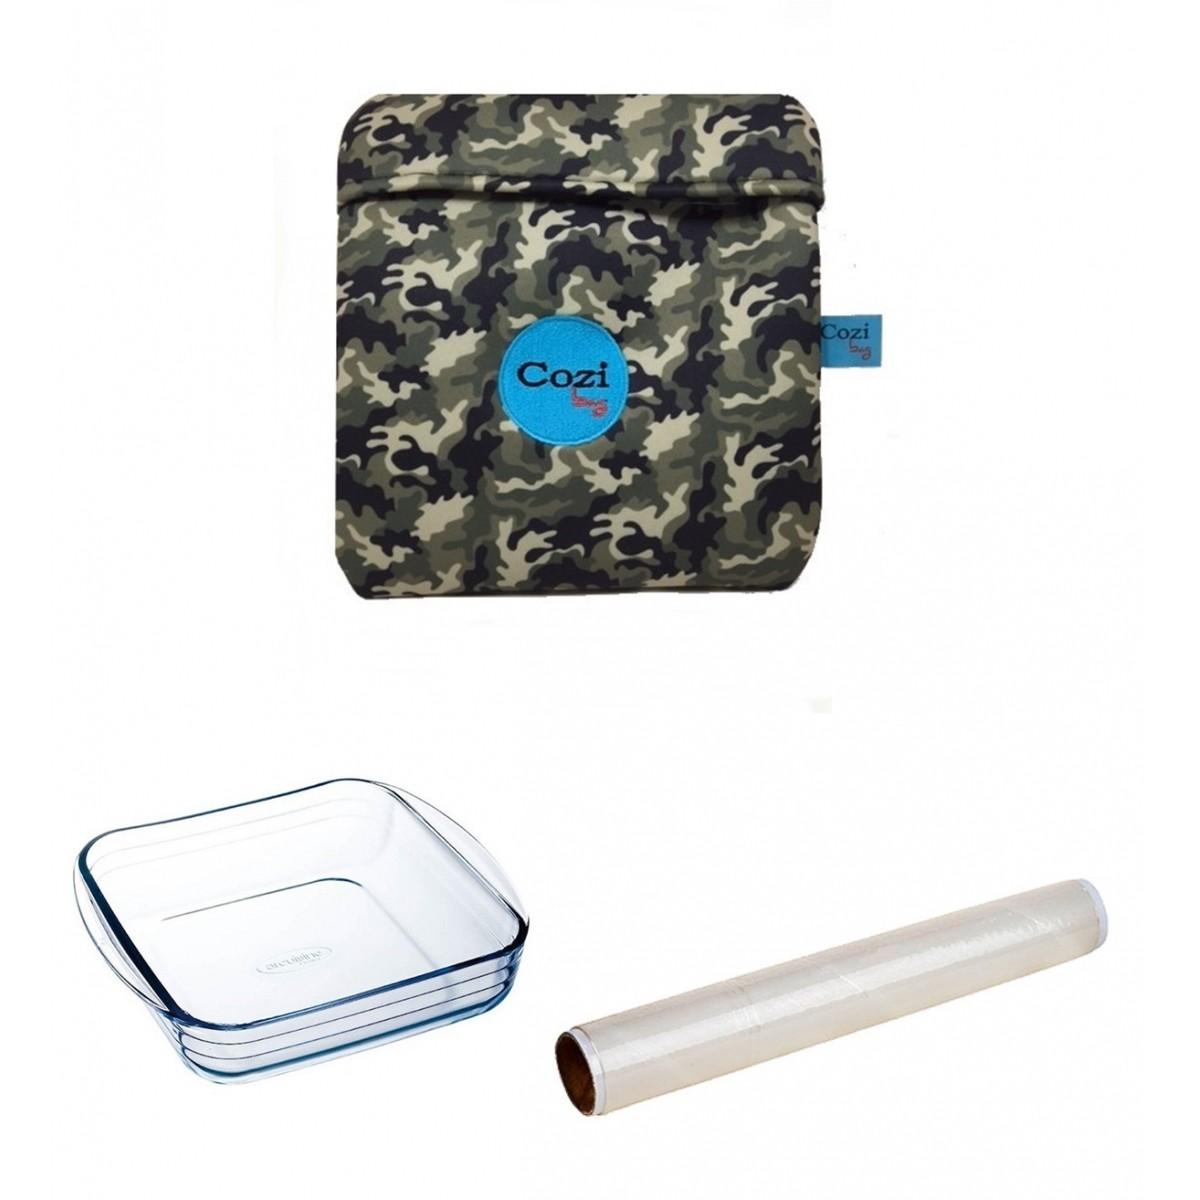 Kit Cozi Bag 1 Litro + Refratária 1 Litro  + Film